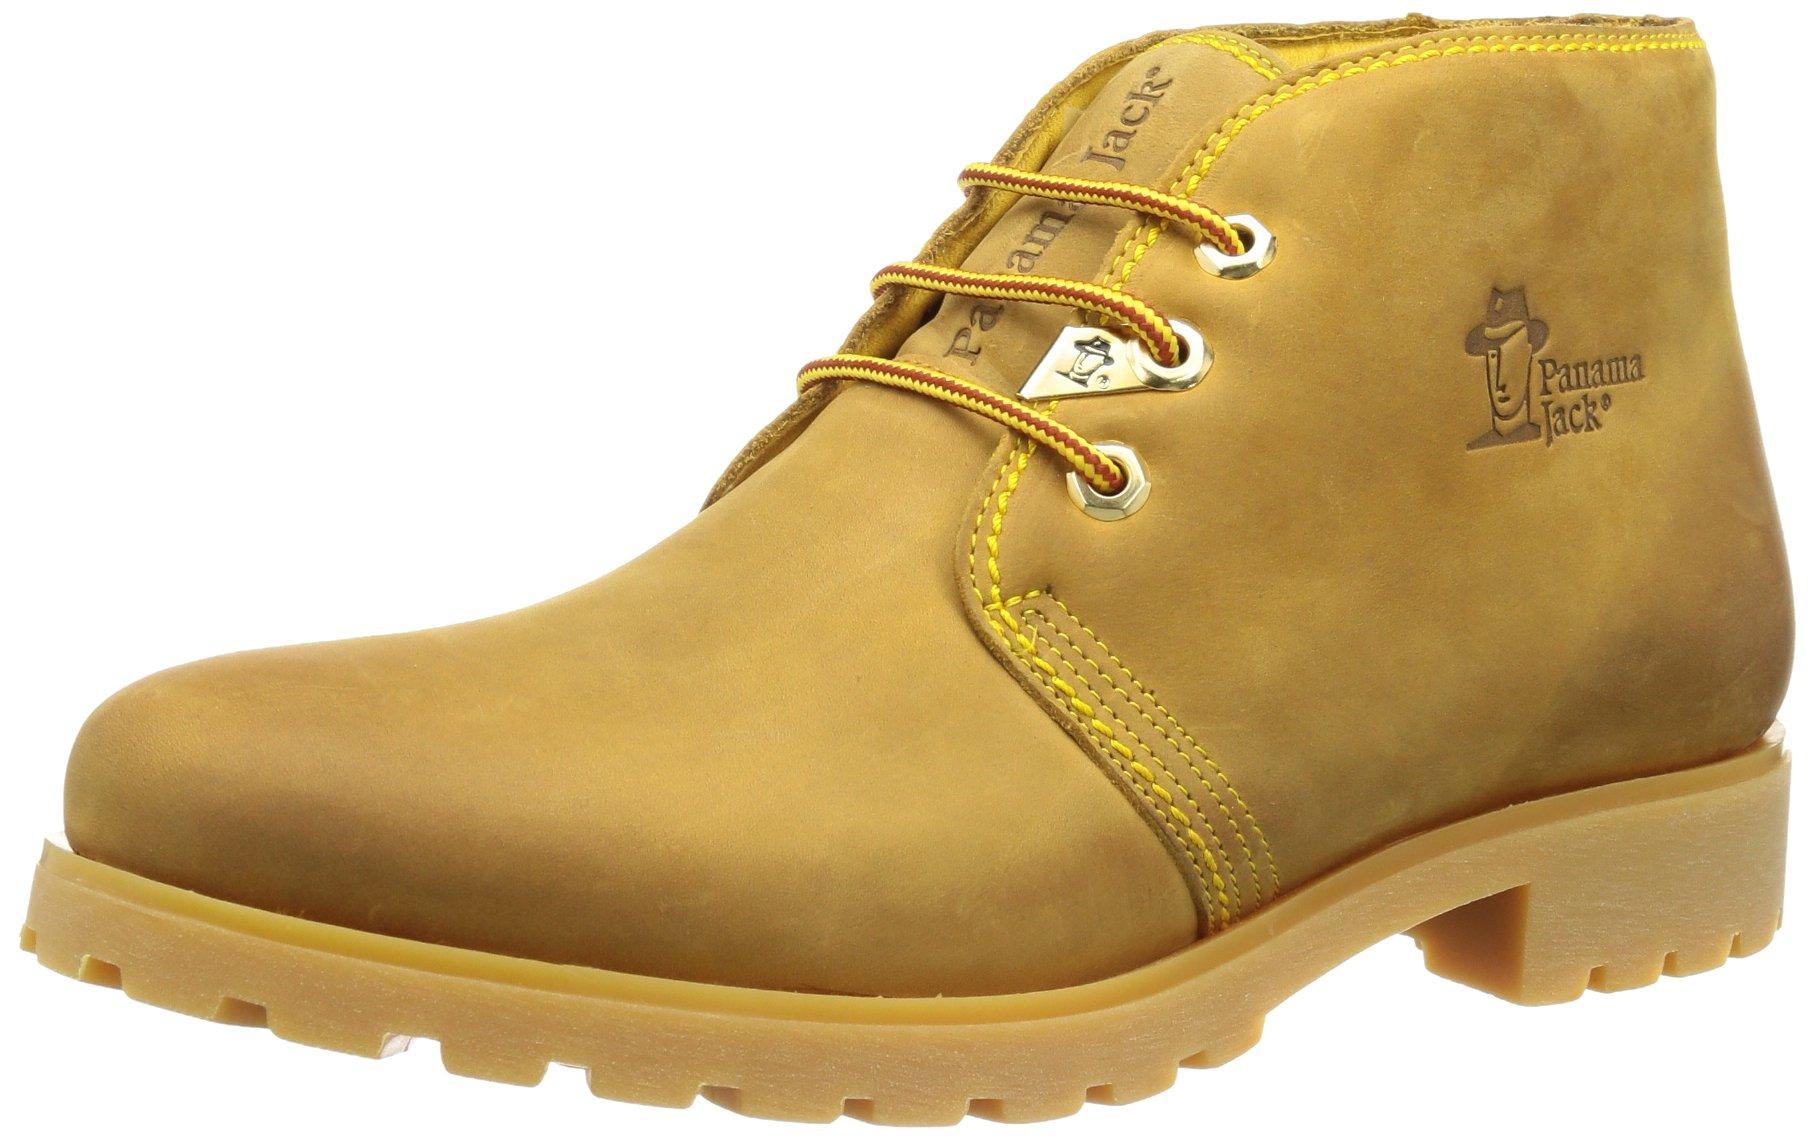 Panama Jack Bota Panama B1, Zapatos de Cordones Brogue Mujer